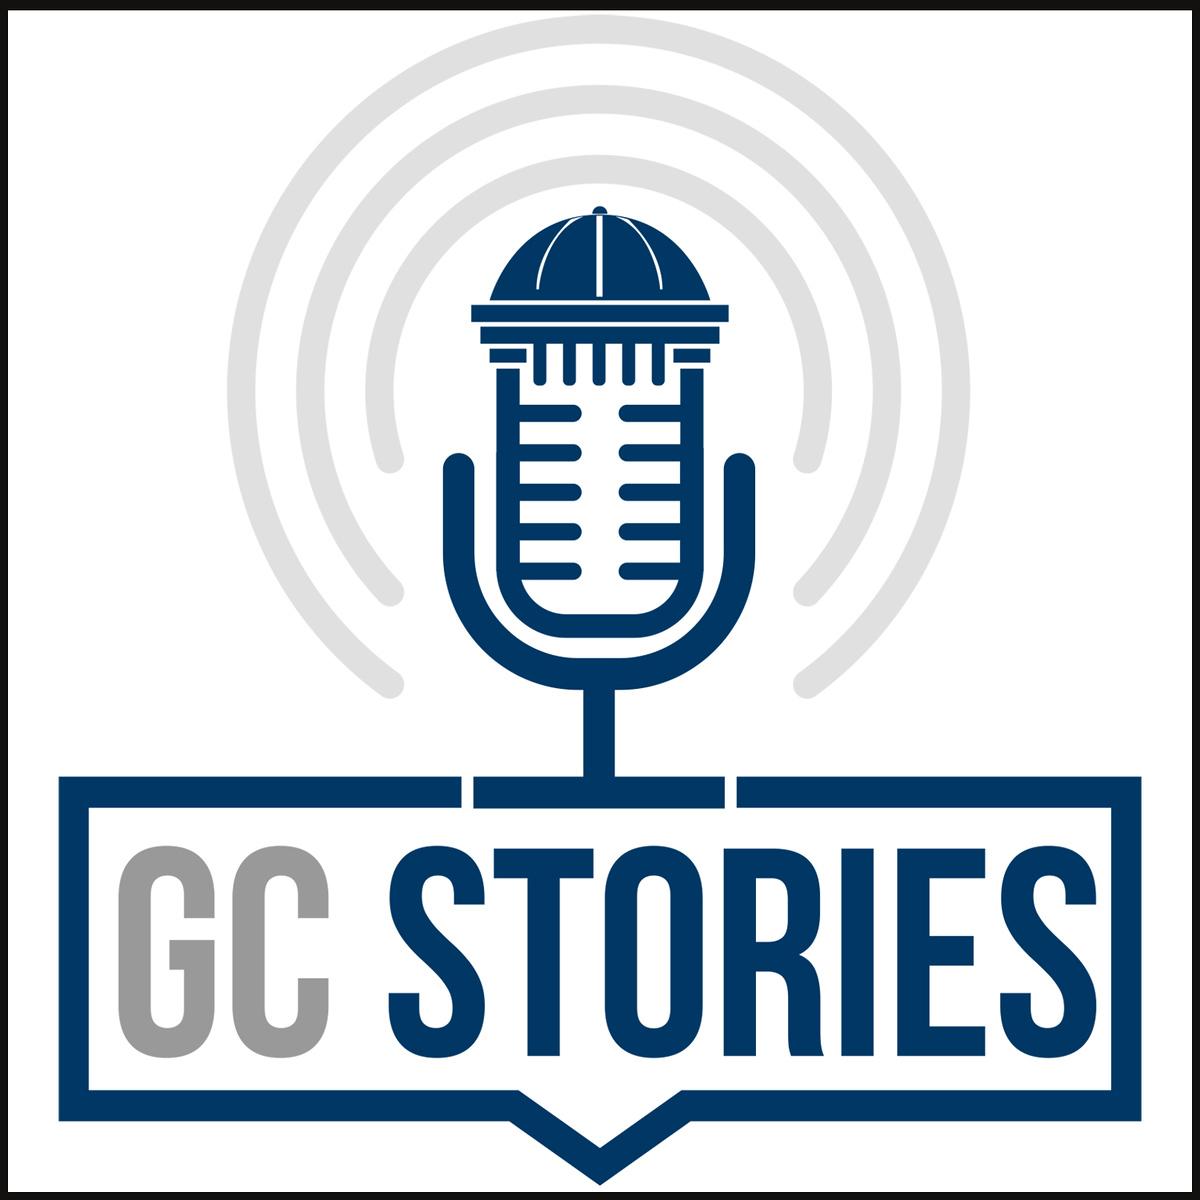 GC Stories logo